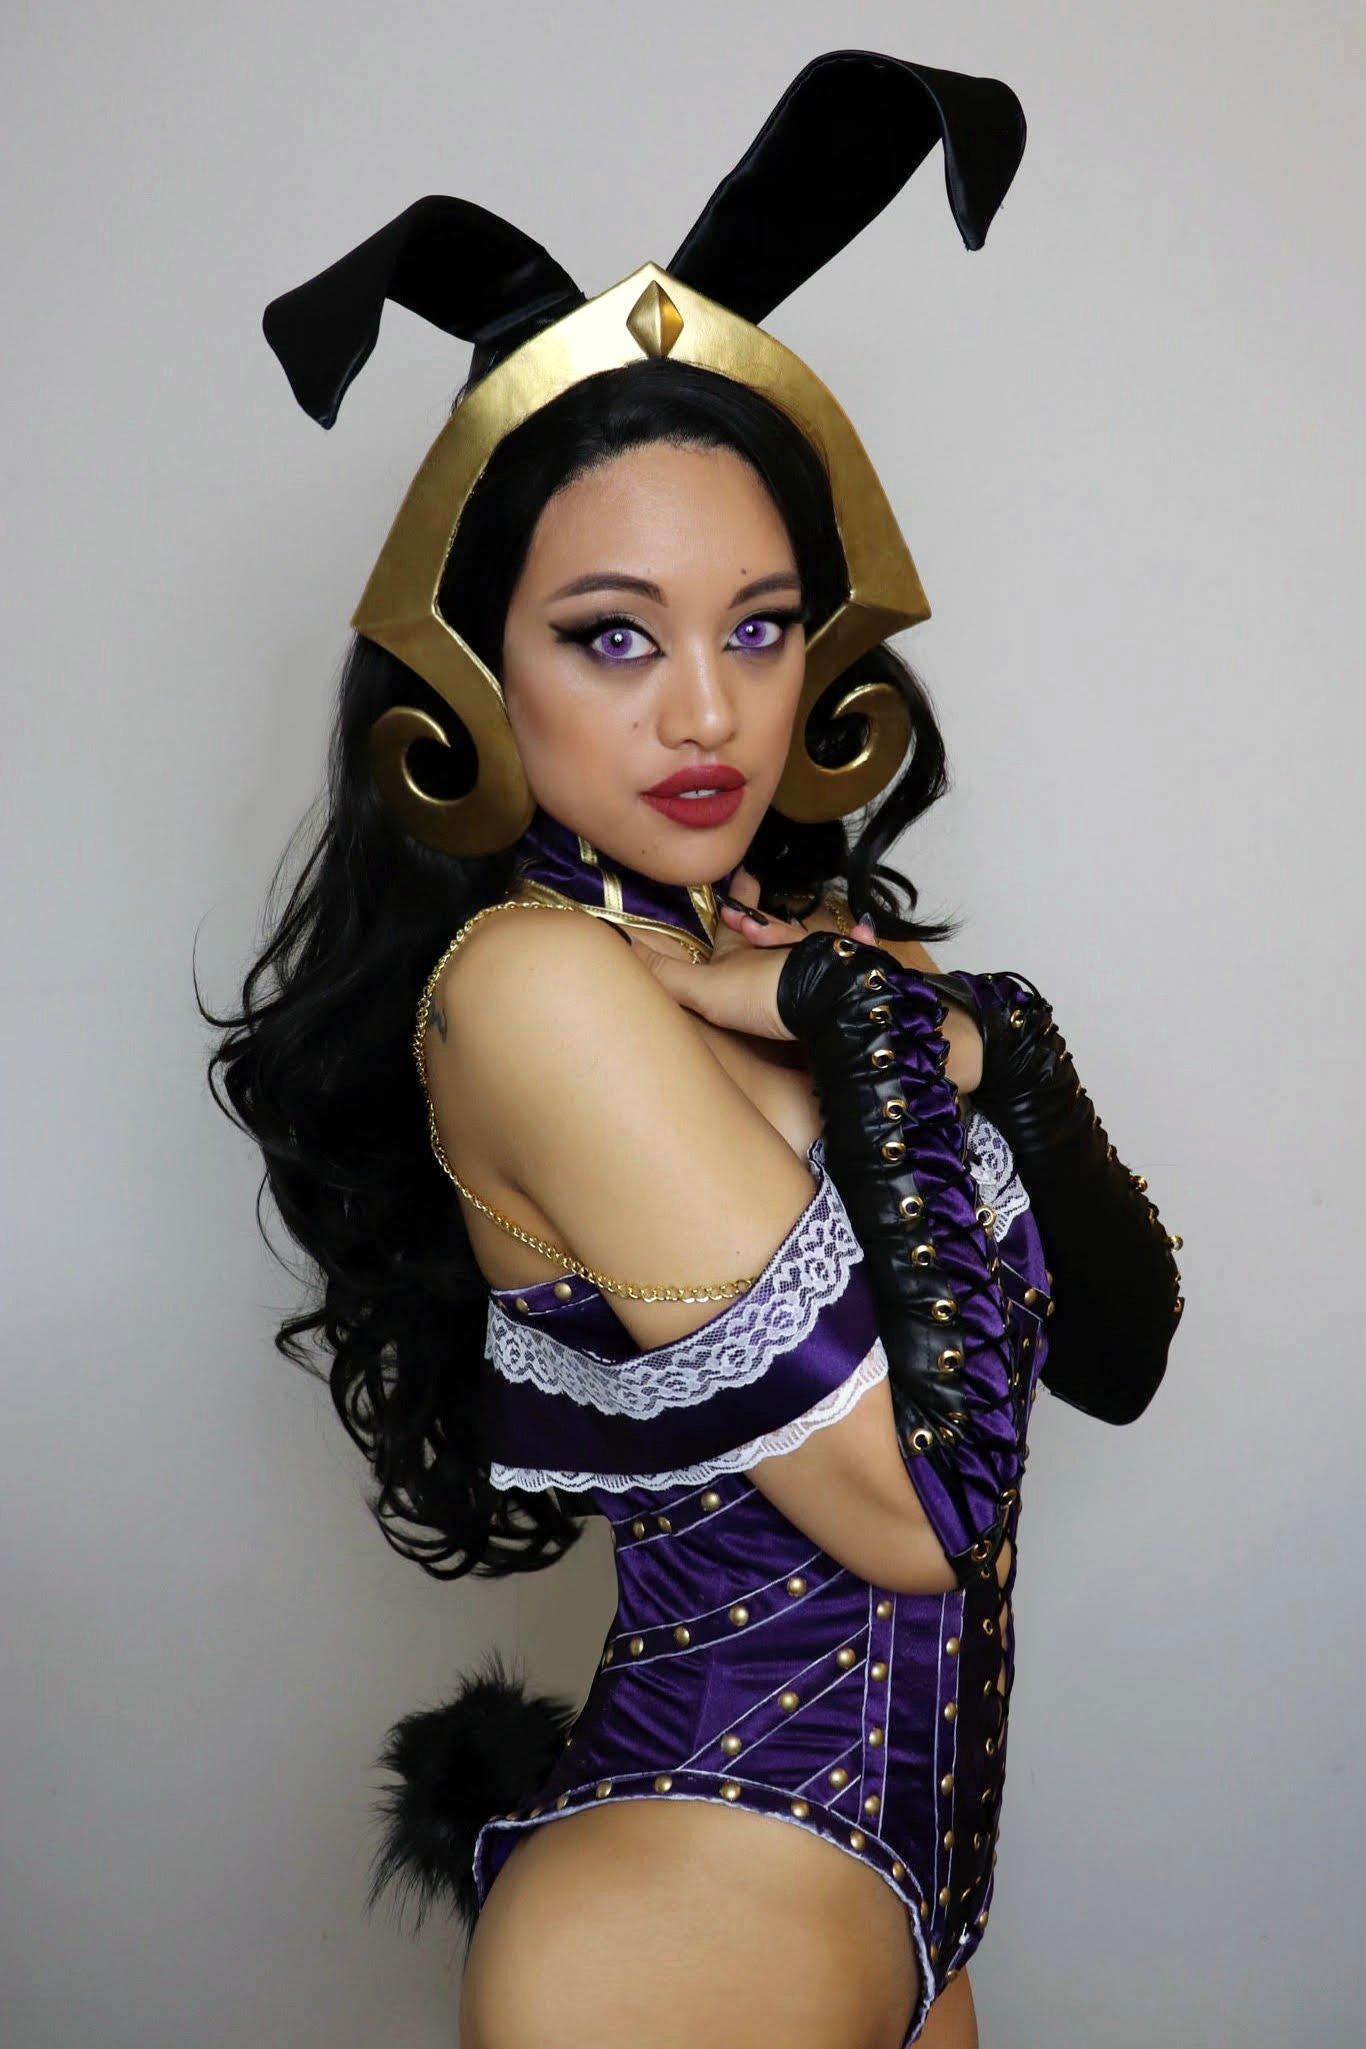 Jana as Liliana